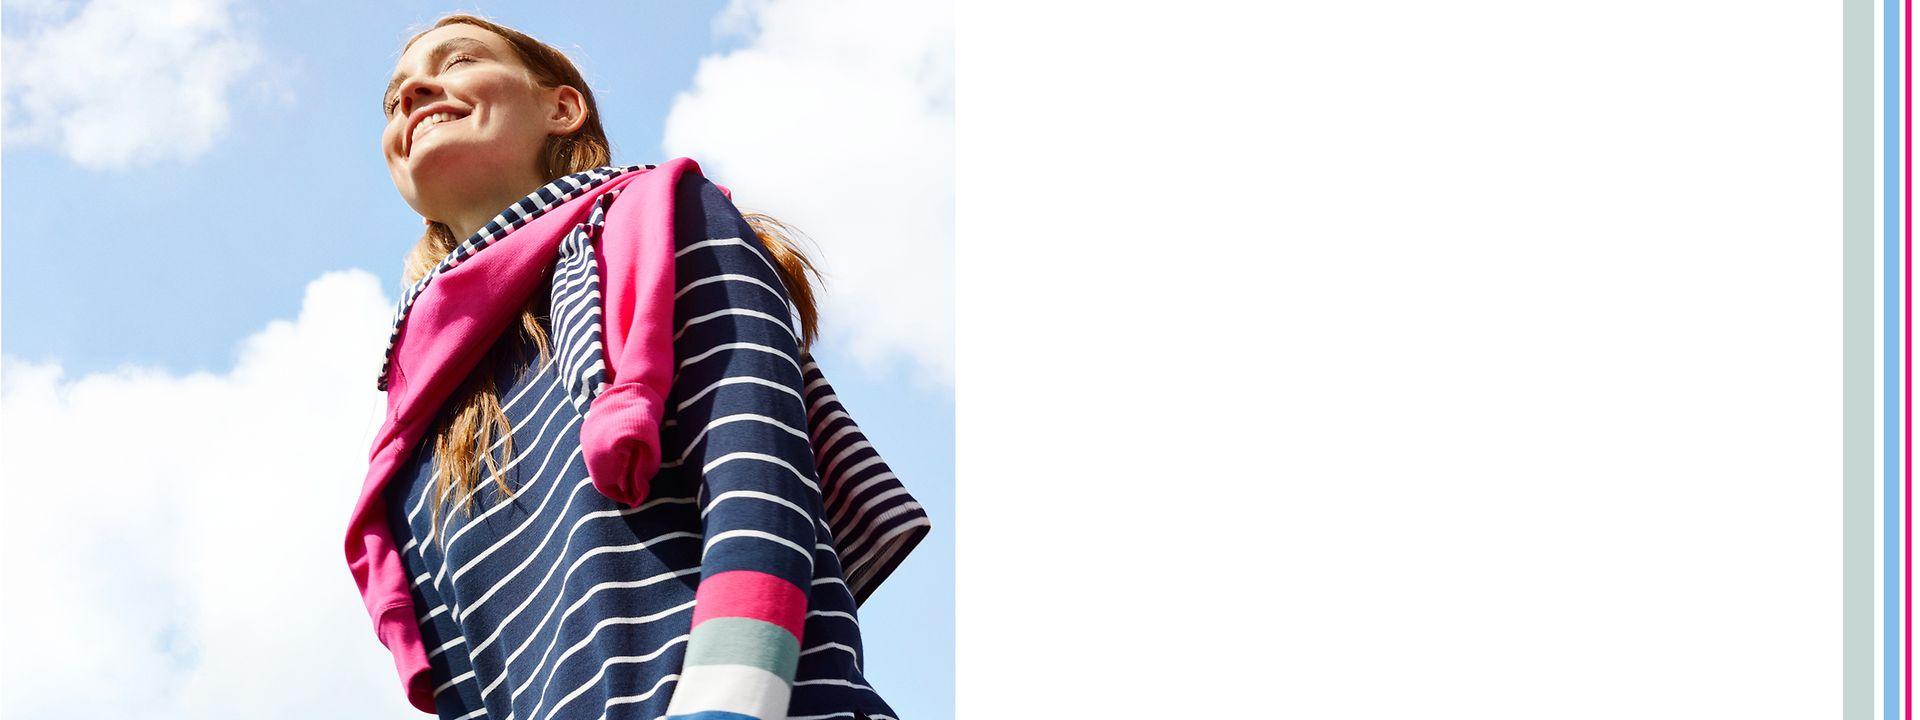 372021 - Unknown - Startpage - Women - Stripes - IMG